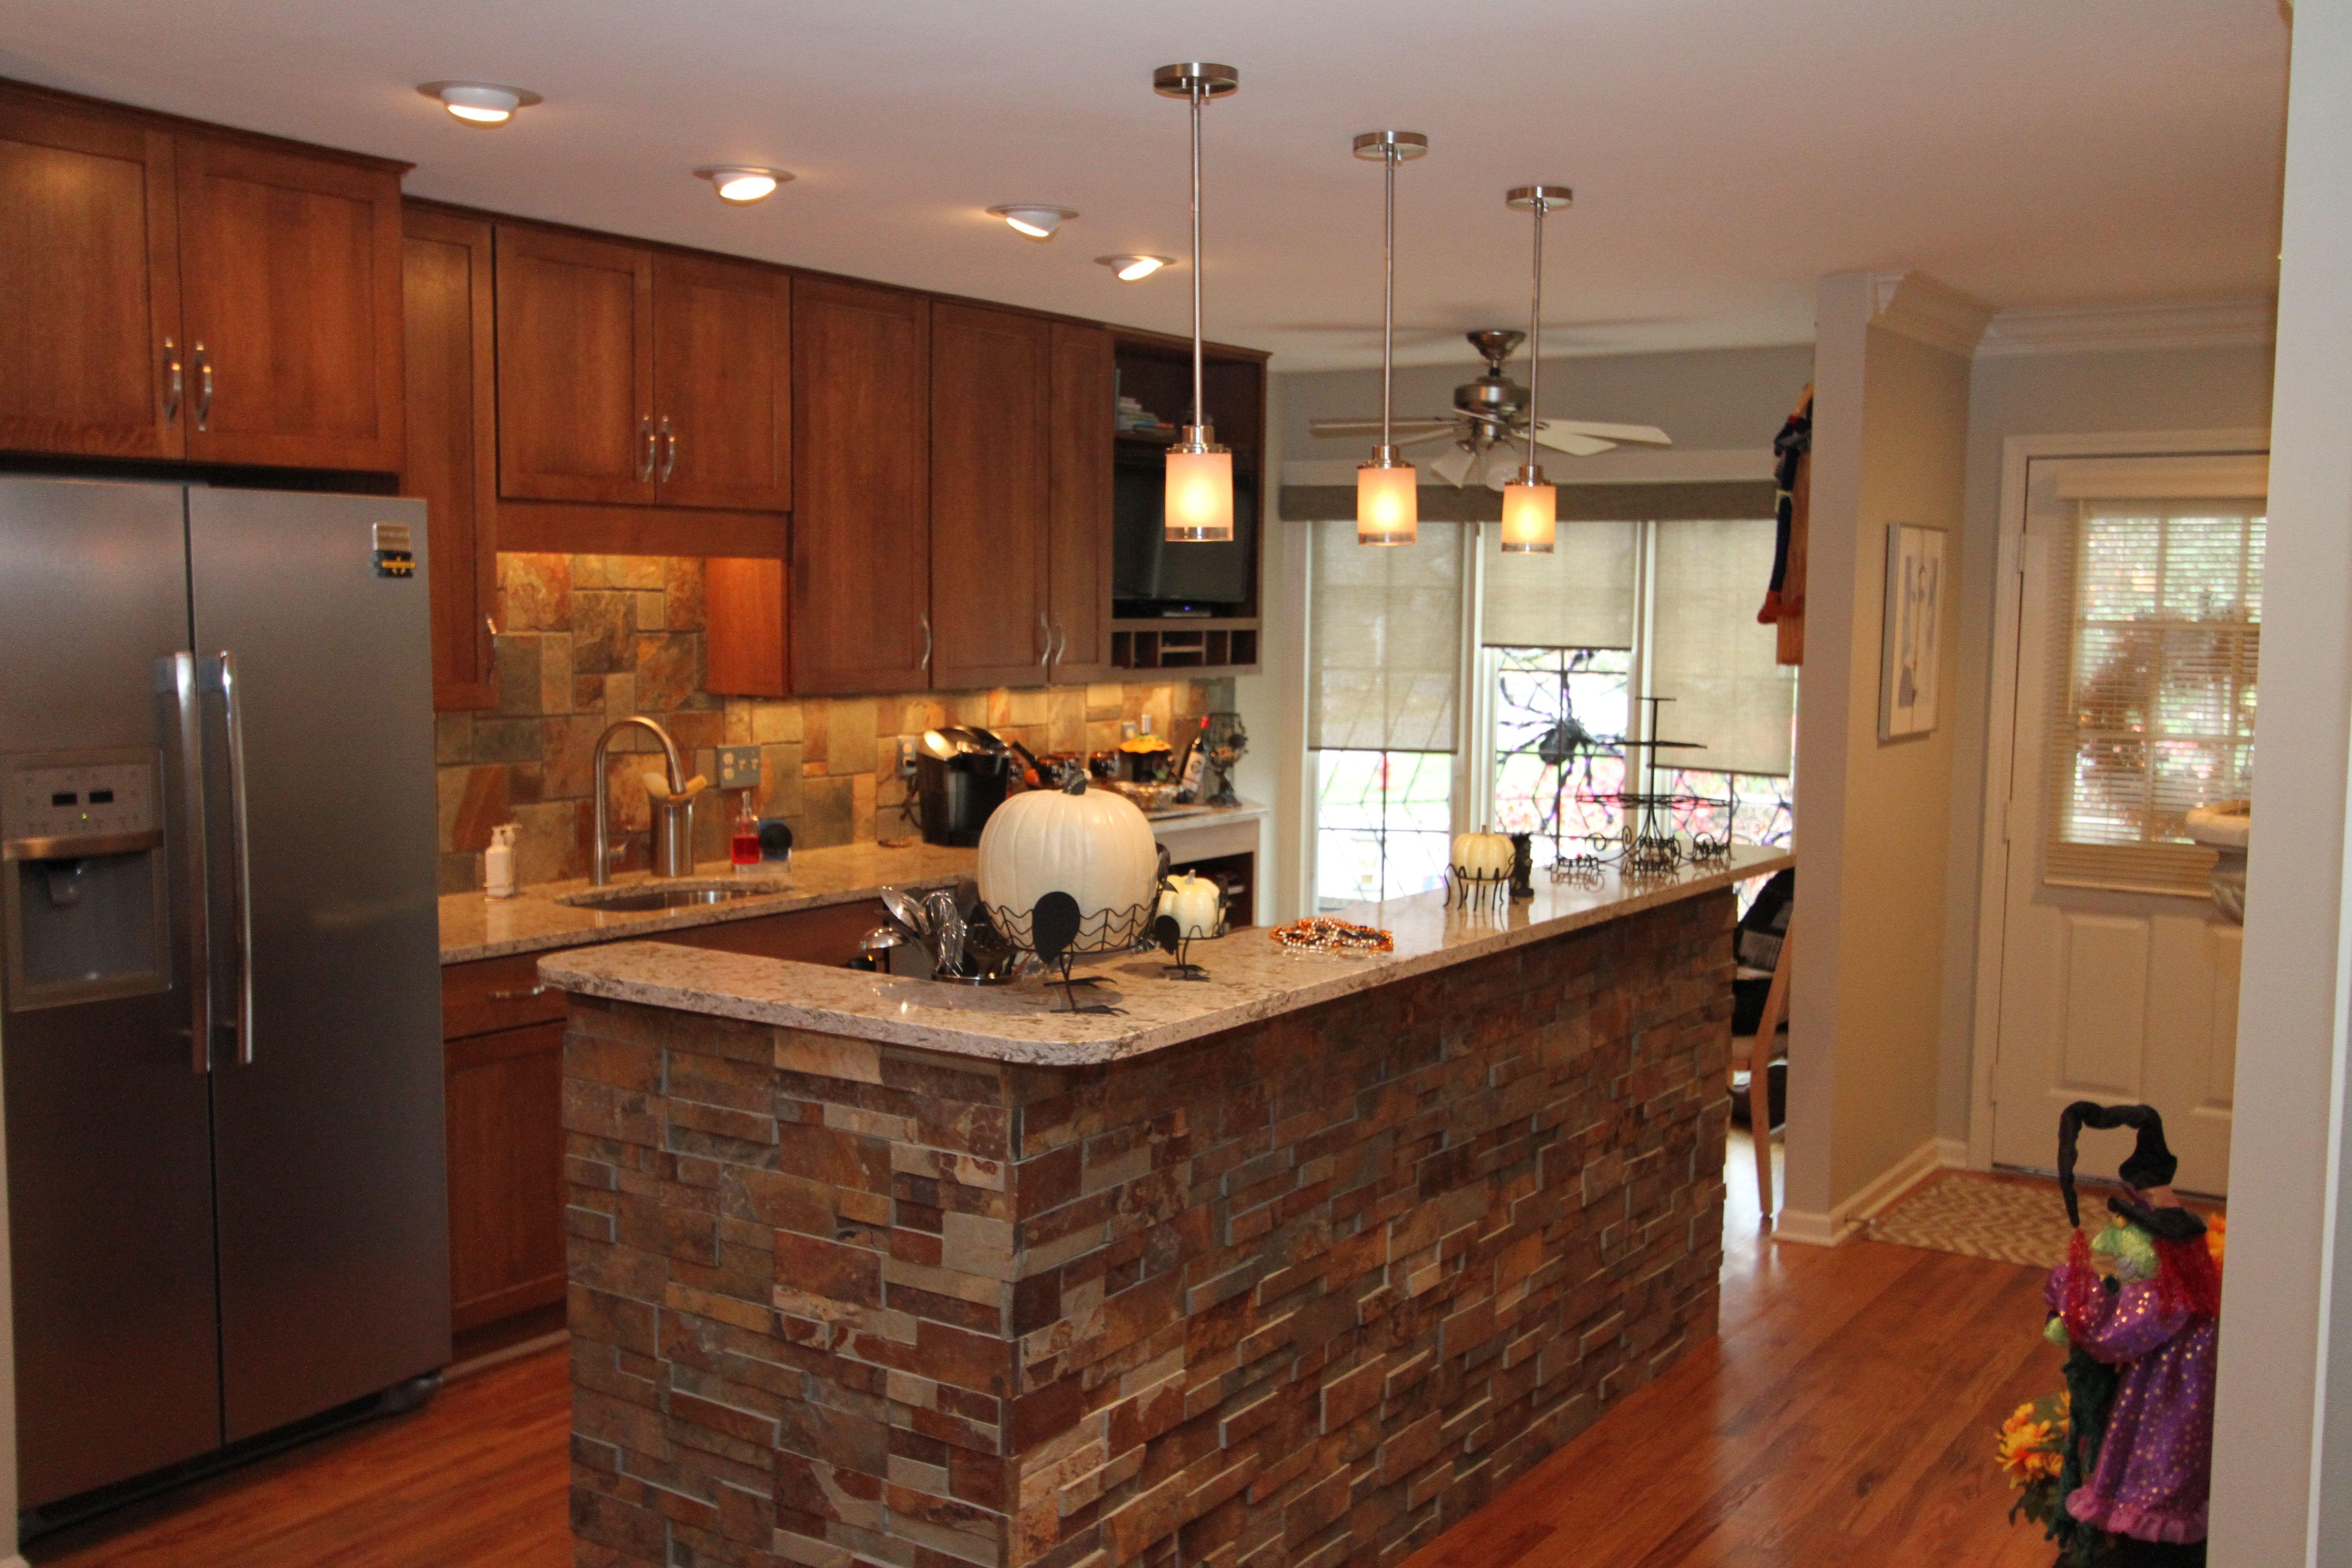 interesting marble backsplash kitchen walls | Open Kitchen with cultured stone backsplash & accent wall ...